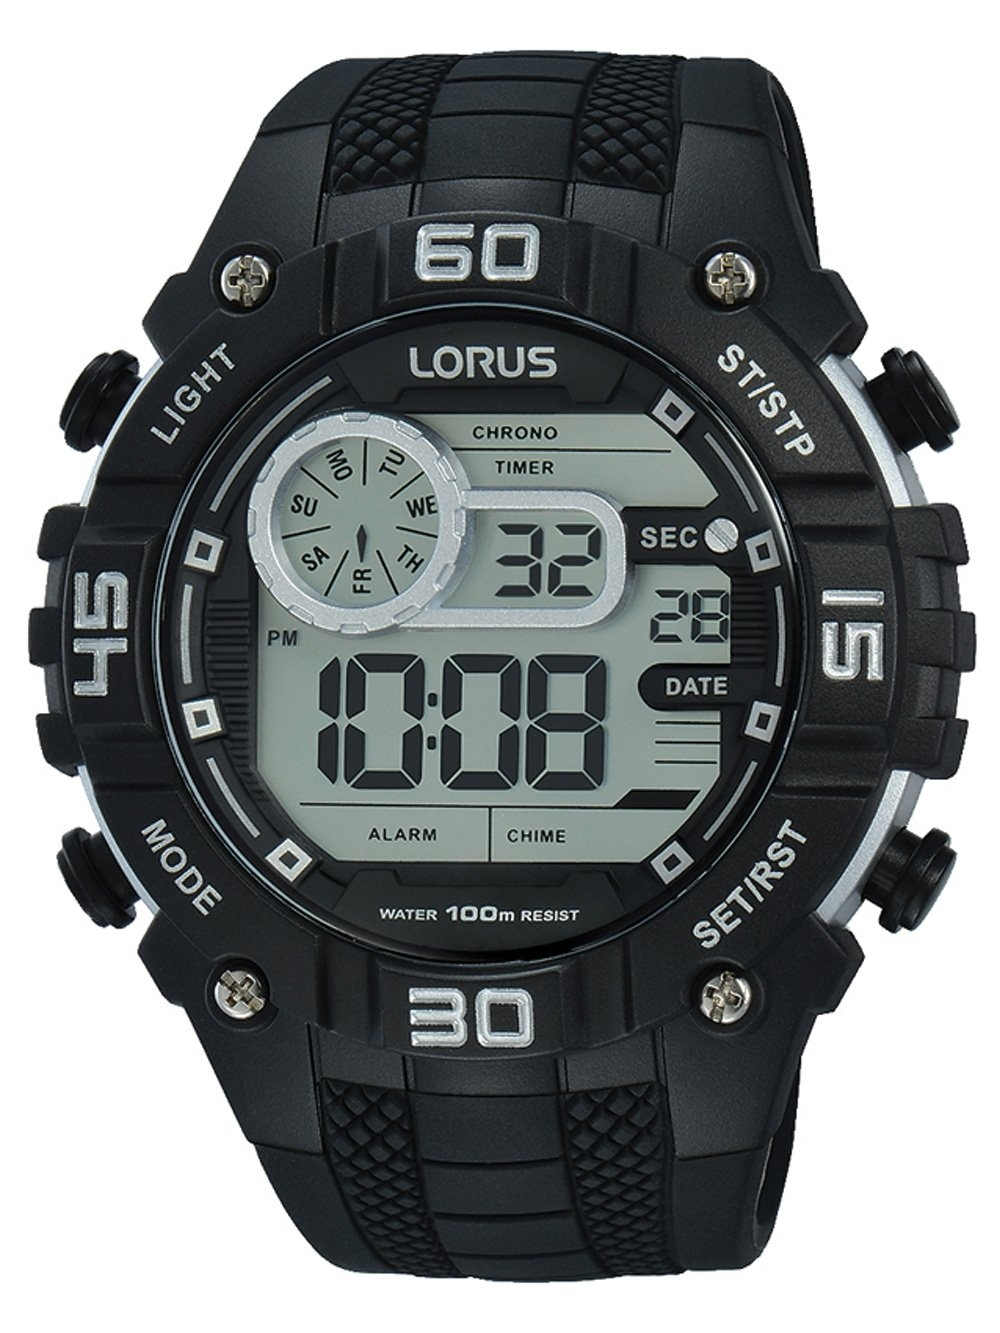 Ceas barbatesc Lorus R2351LX9 Digi Chrono 50mm 10ATM